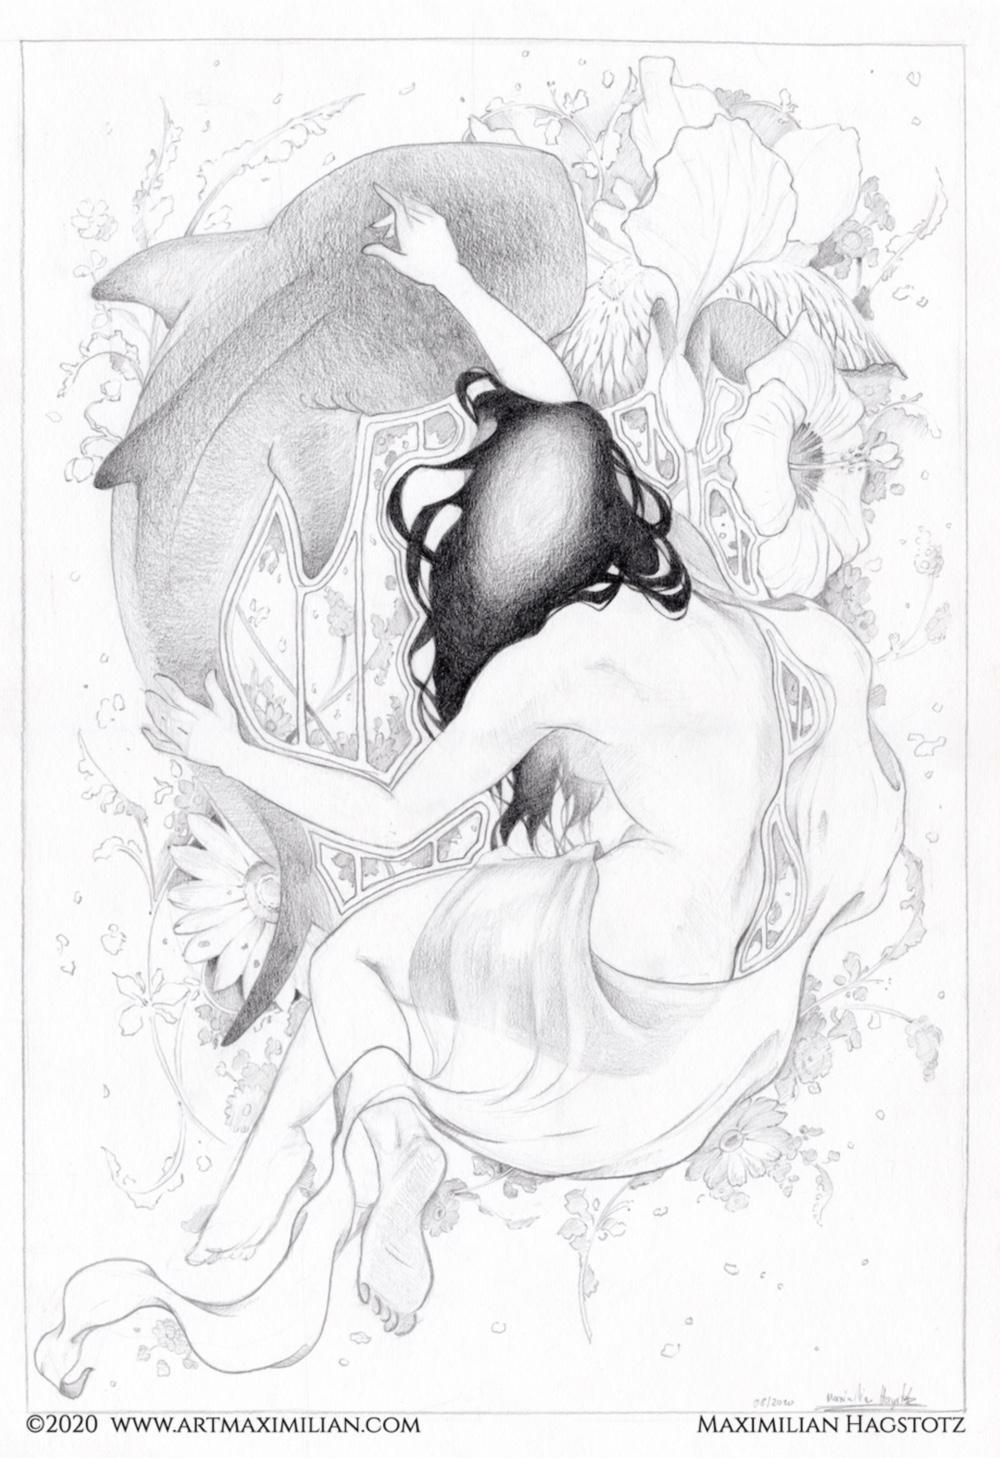 Grafik Kunst Zeichnung Maximilian Hagstotz Traum Kolibri artnoveau Tuch opulent Blumen Bukett Frau Tanzend neu schön viel Geschenkidee Mann Frau Tiere Vögel illustration Deko wandkunst Wallart Walhai